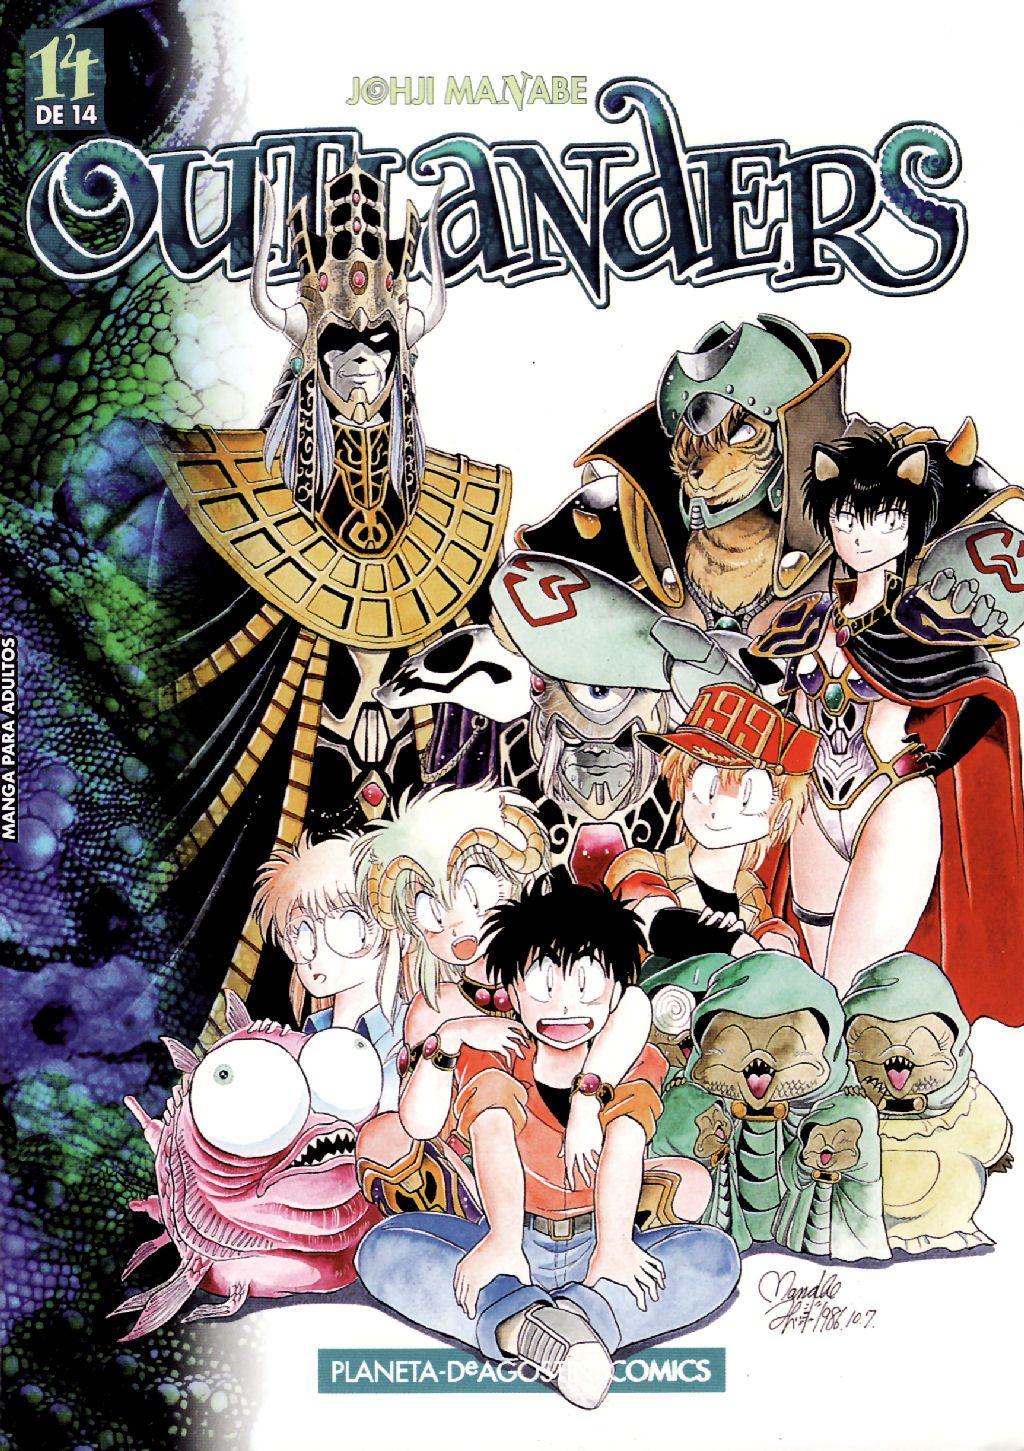 https://c5.ninemanga.com/es_manga/49/20145/482439/2f60d946251d2dfd719925f3fa1fed01.jpg Page 1